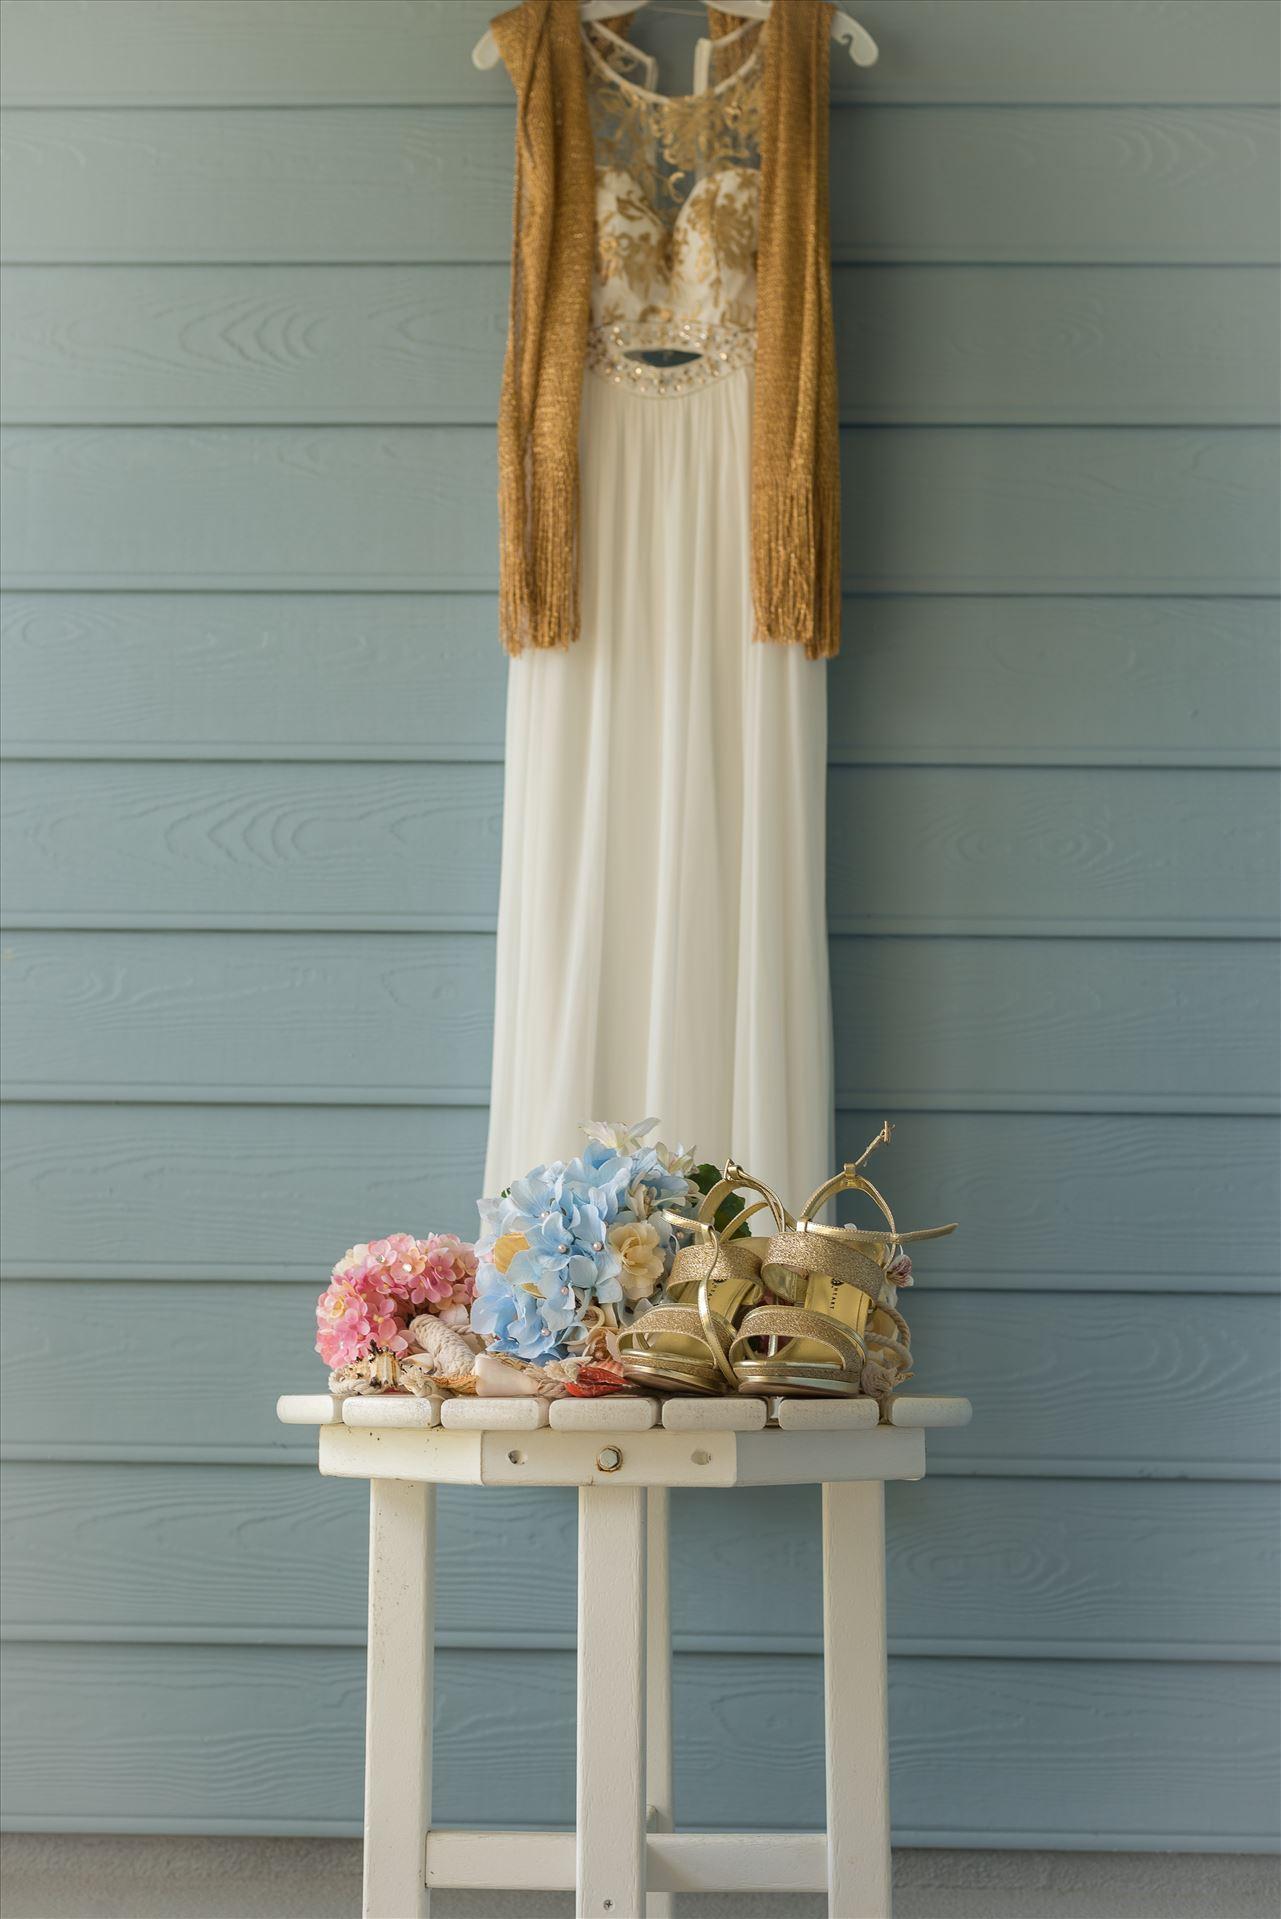 Ross Beach Wedding 03  by Sarah Williams